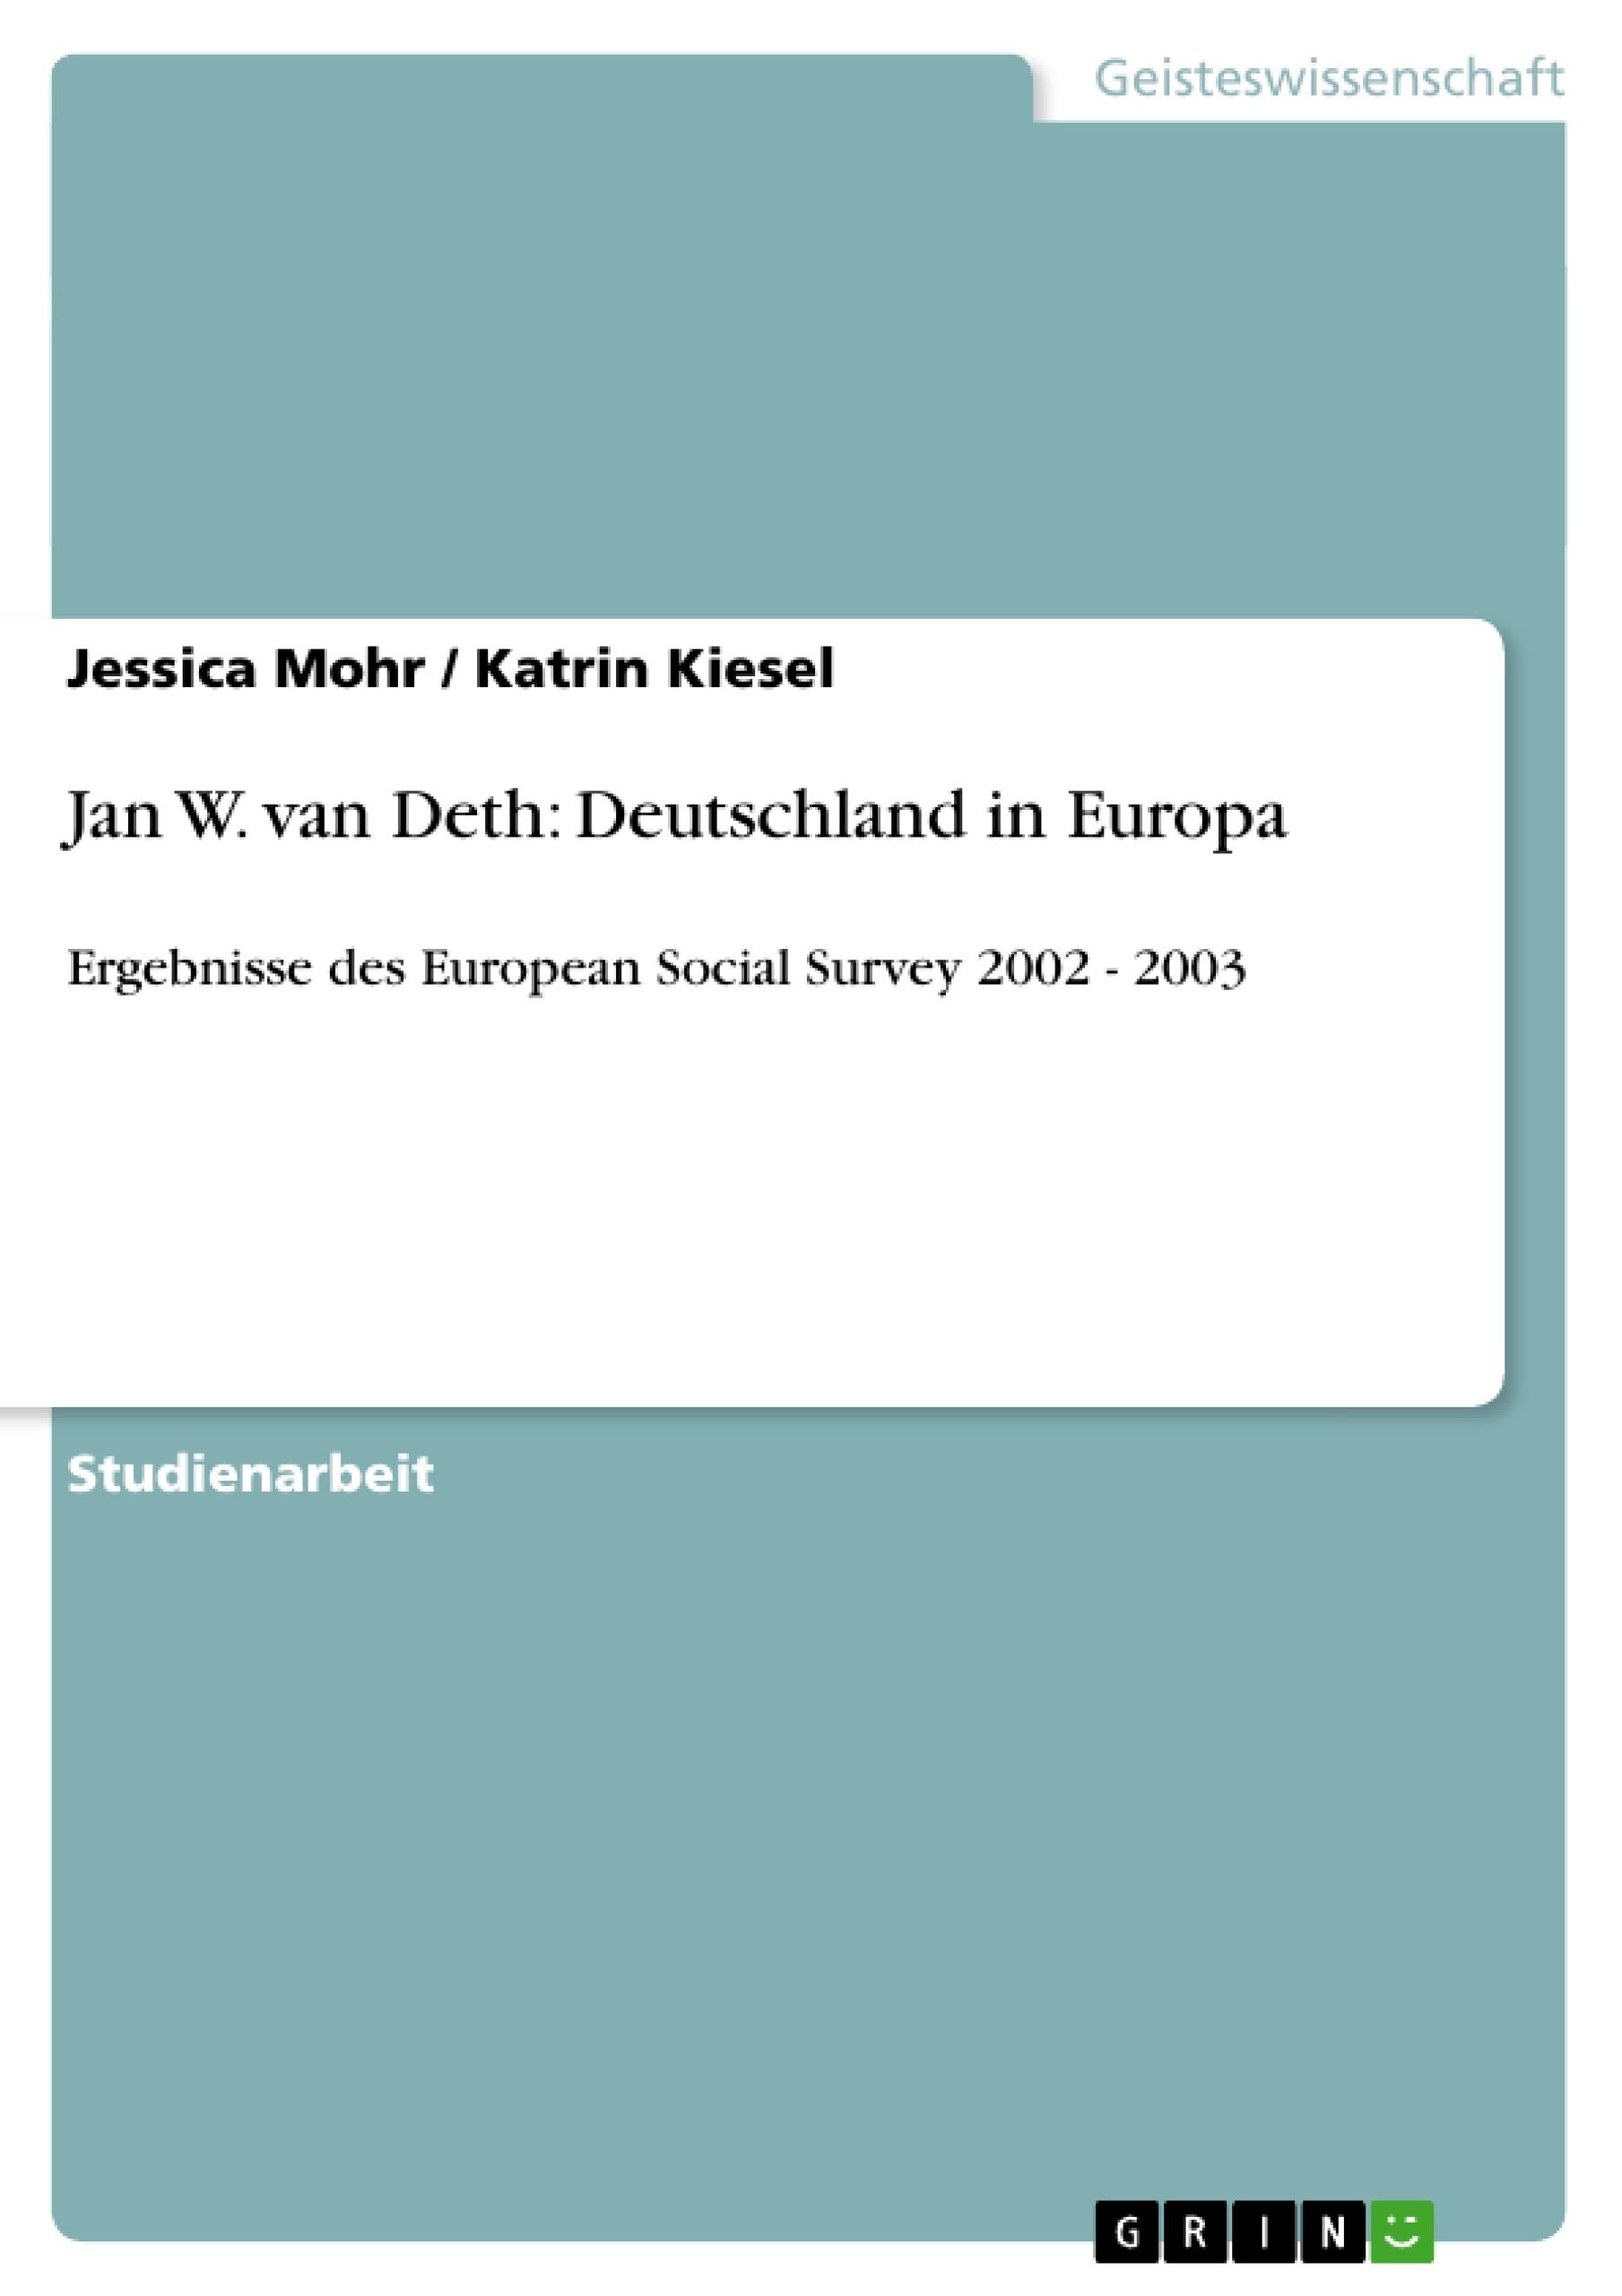 Titel: Jan W. van Deth: Deutschland in Europa